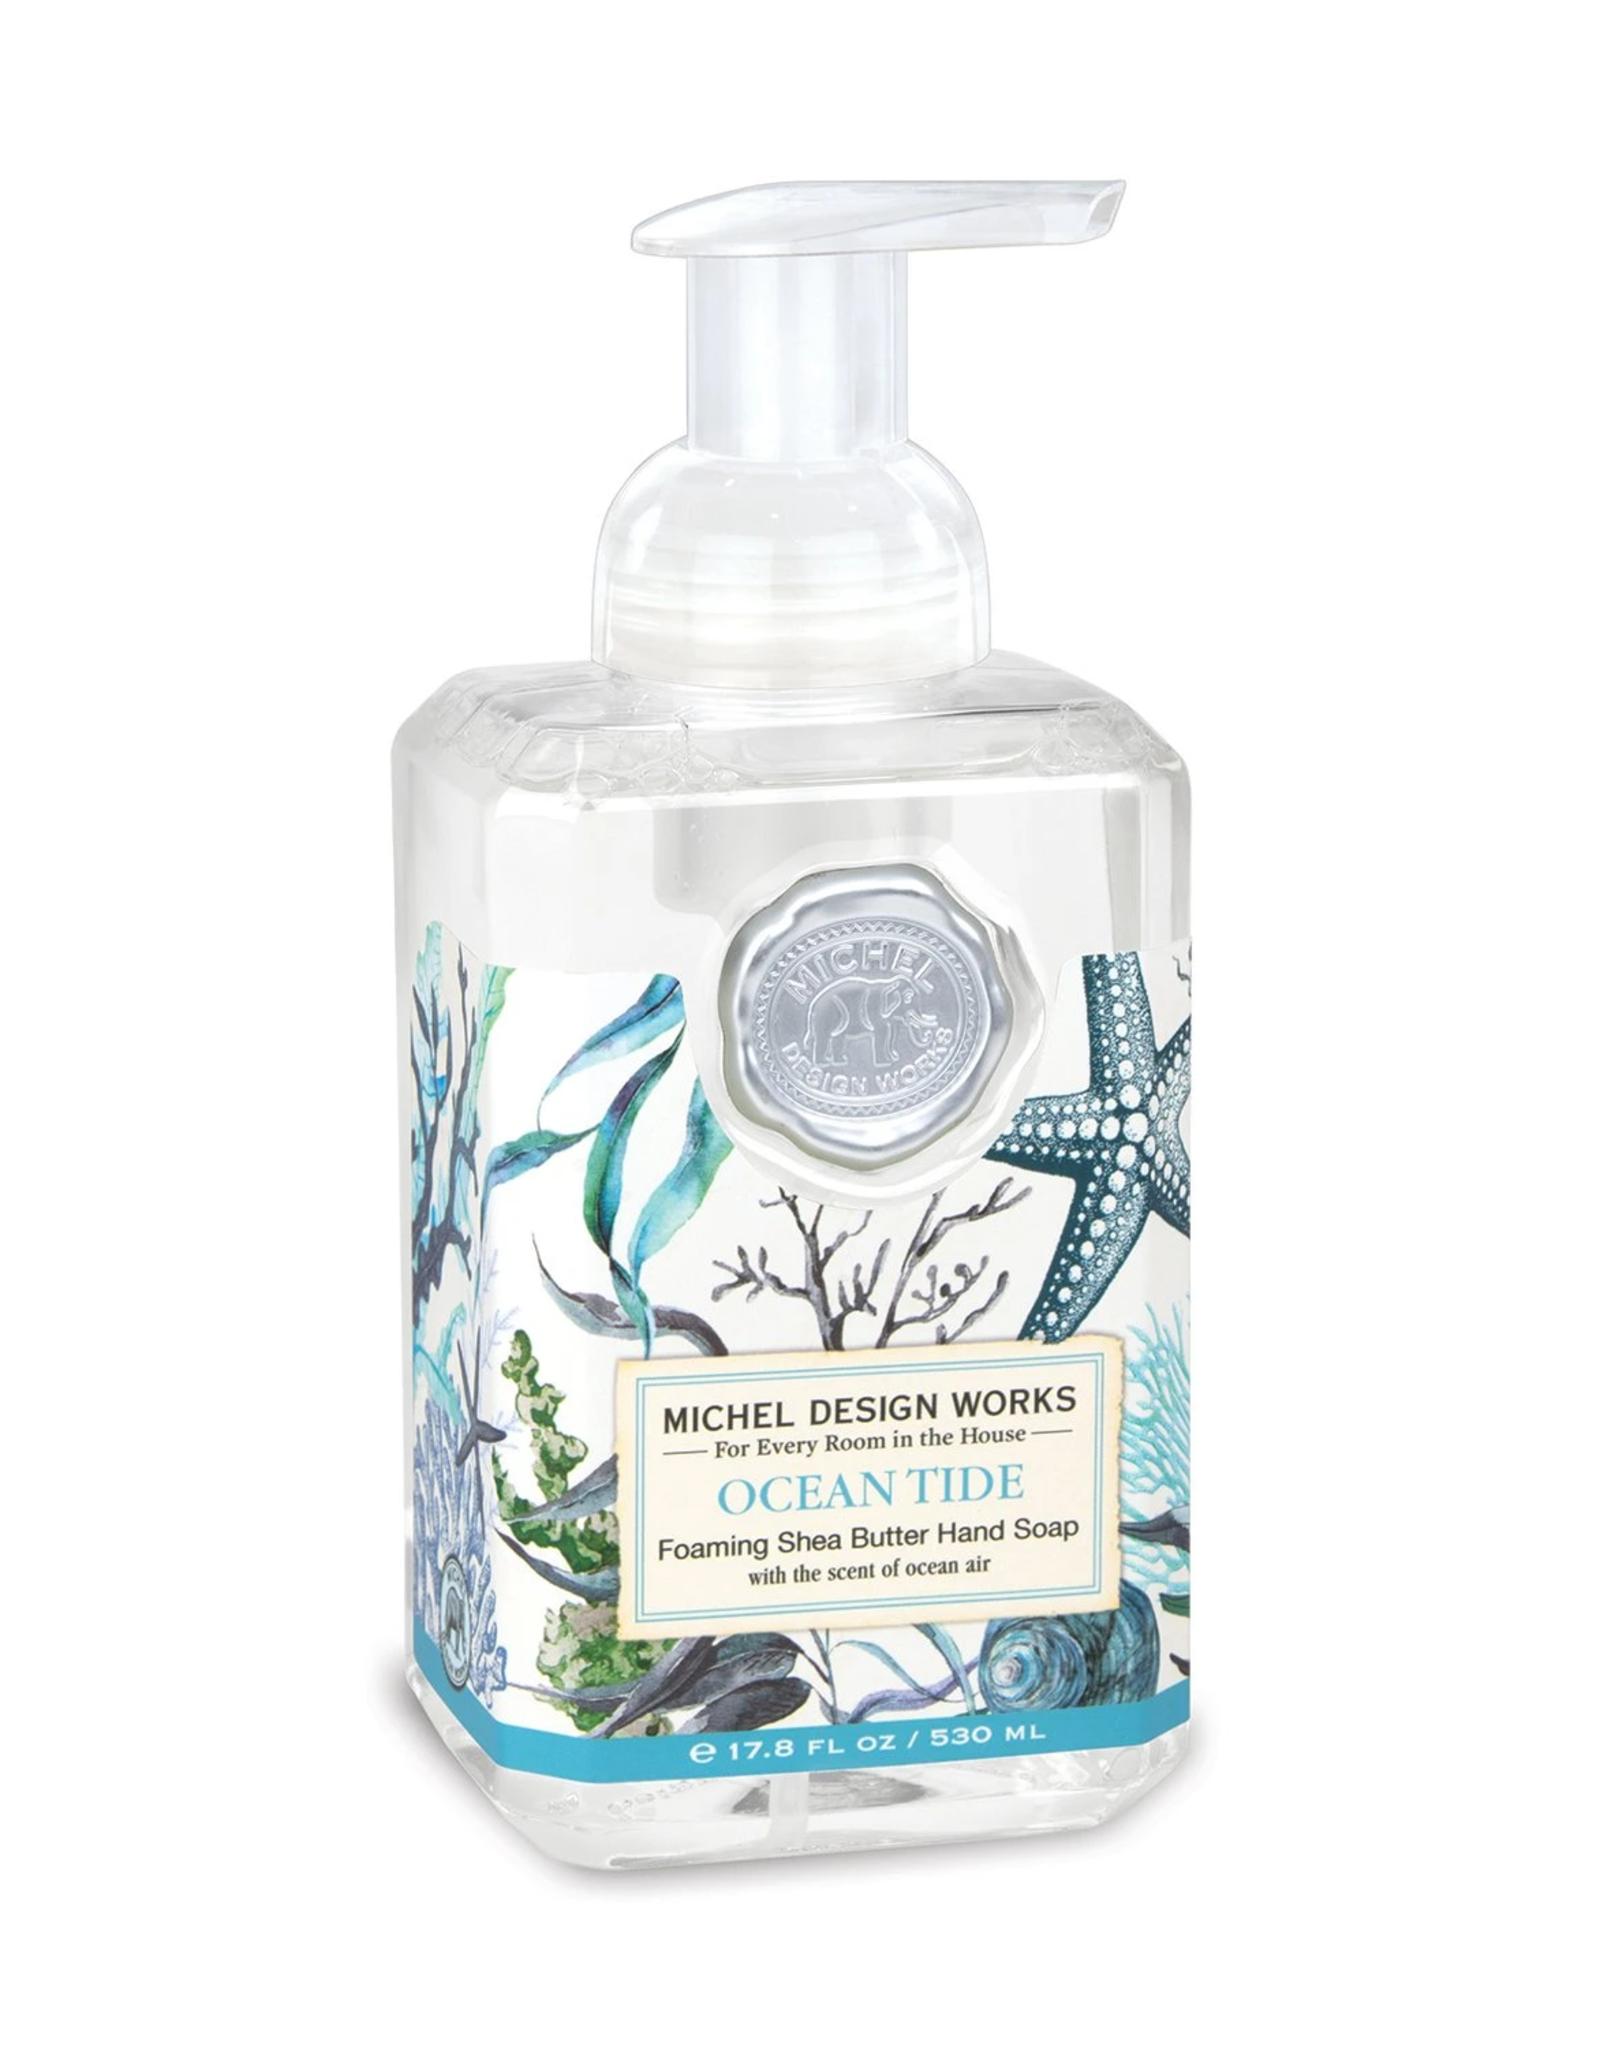 MichelDesign Works Foaming Hand Soap